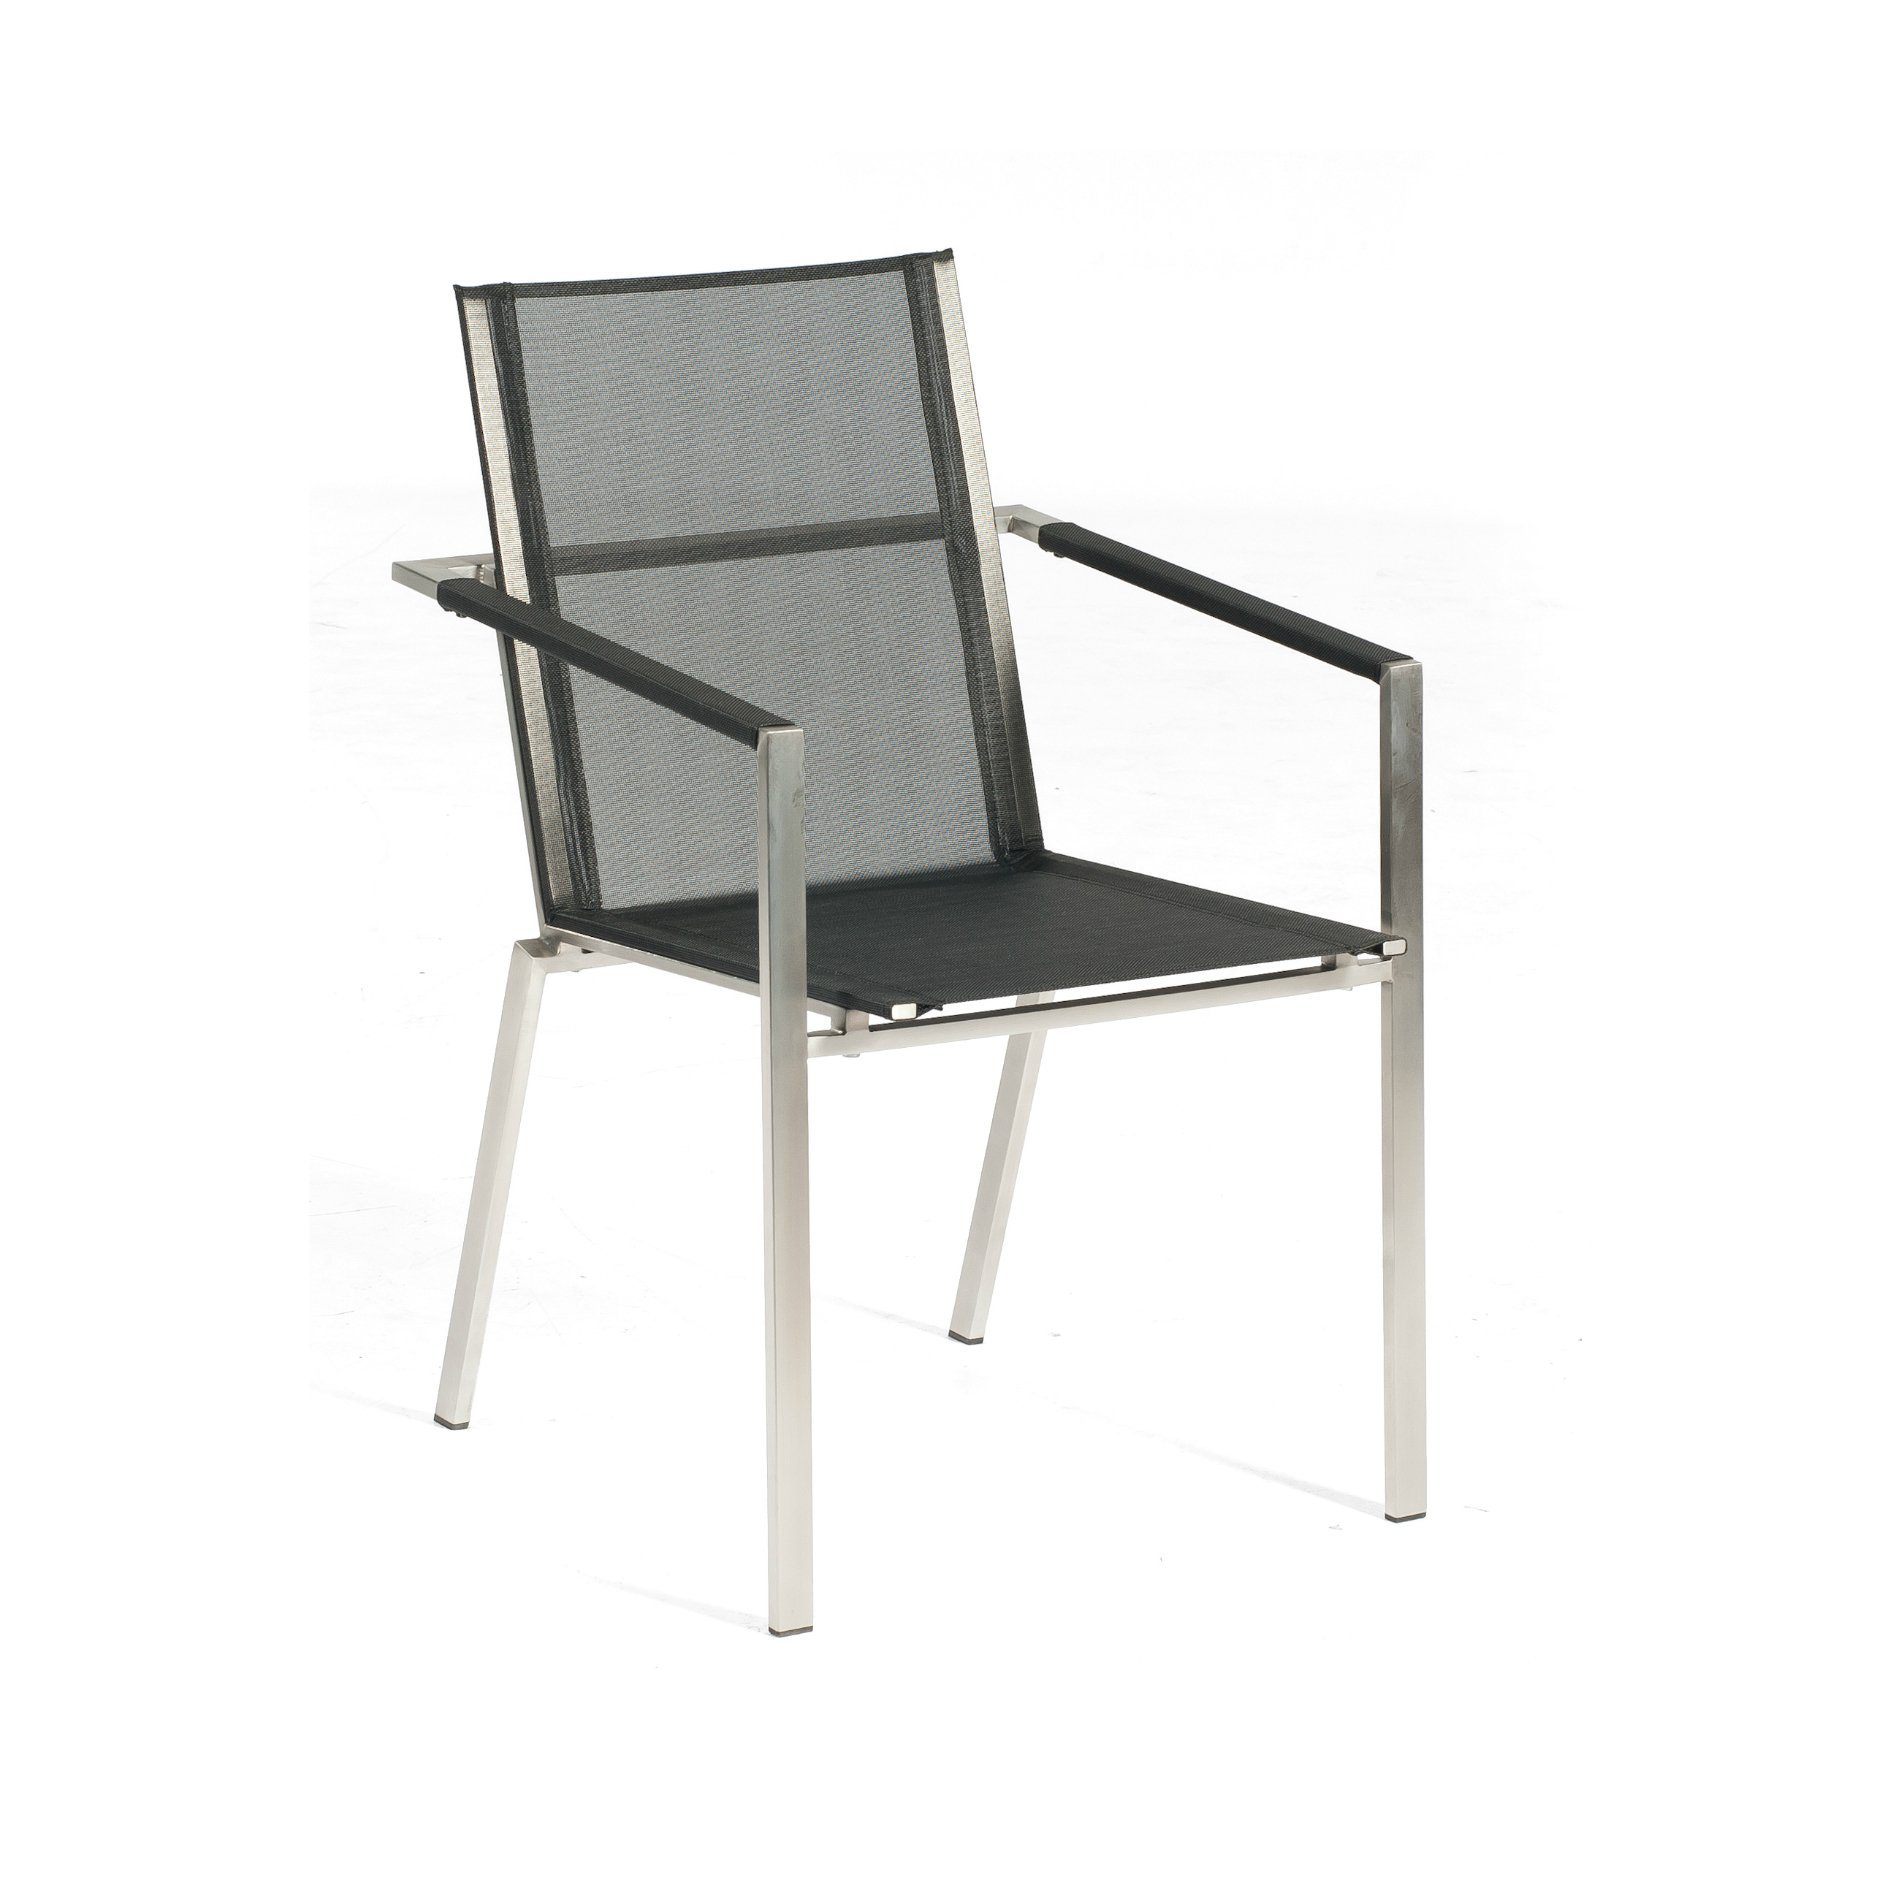 sonnenpartner platinum stapelsessel. Black Bedroom Furniture Sets. Home Design Ideas